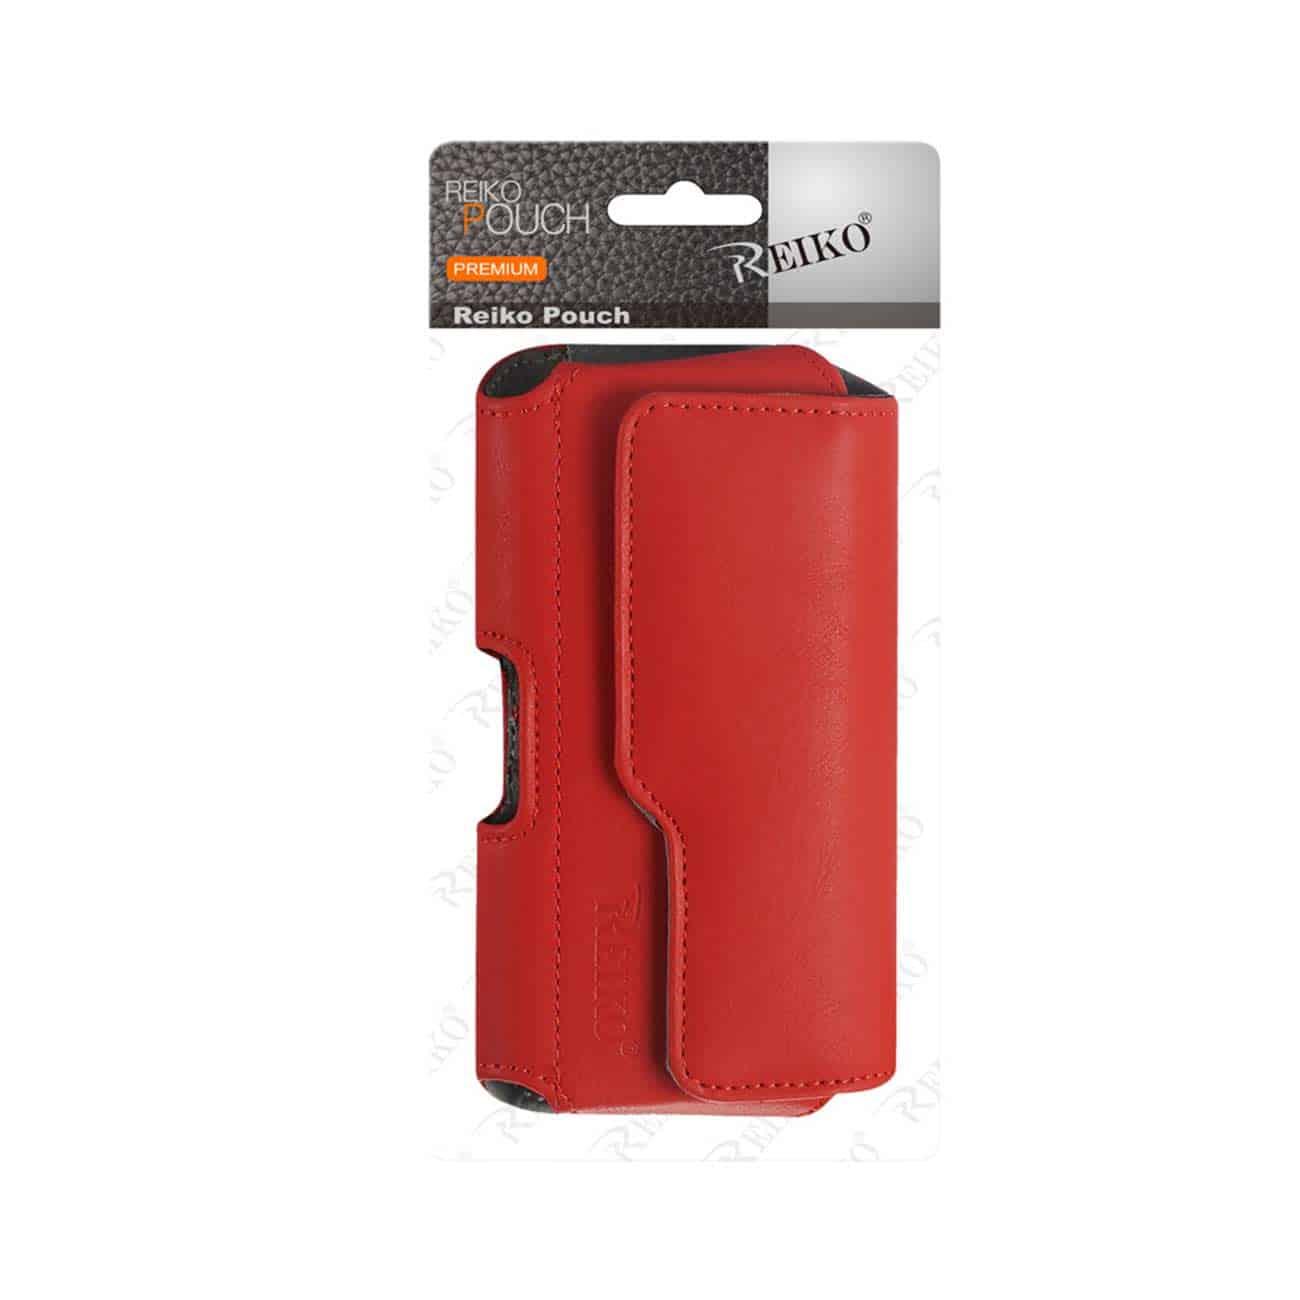 HORIZONTAL Z LID LEATHER POUCH SAMSUNG GALAXY S3/ I9300/ R53 X PLUS RED